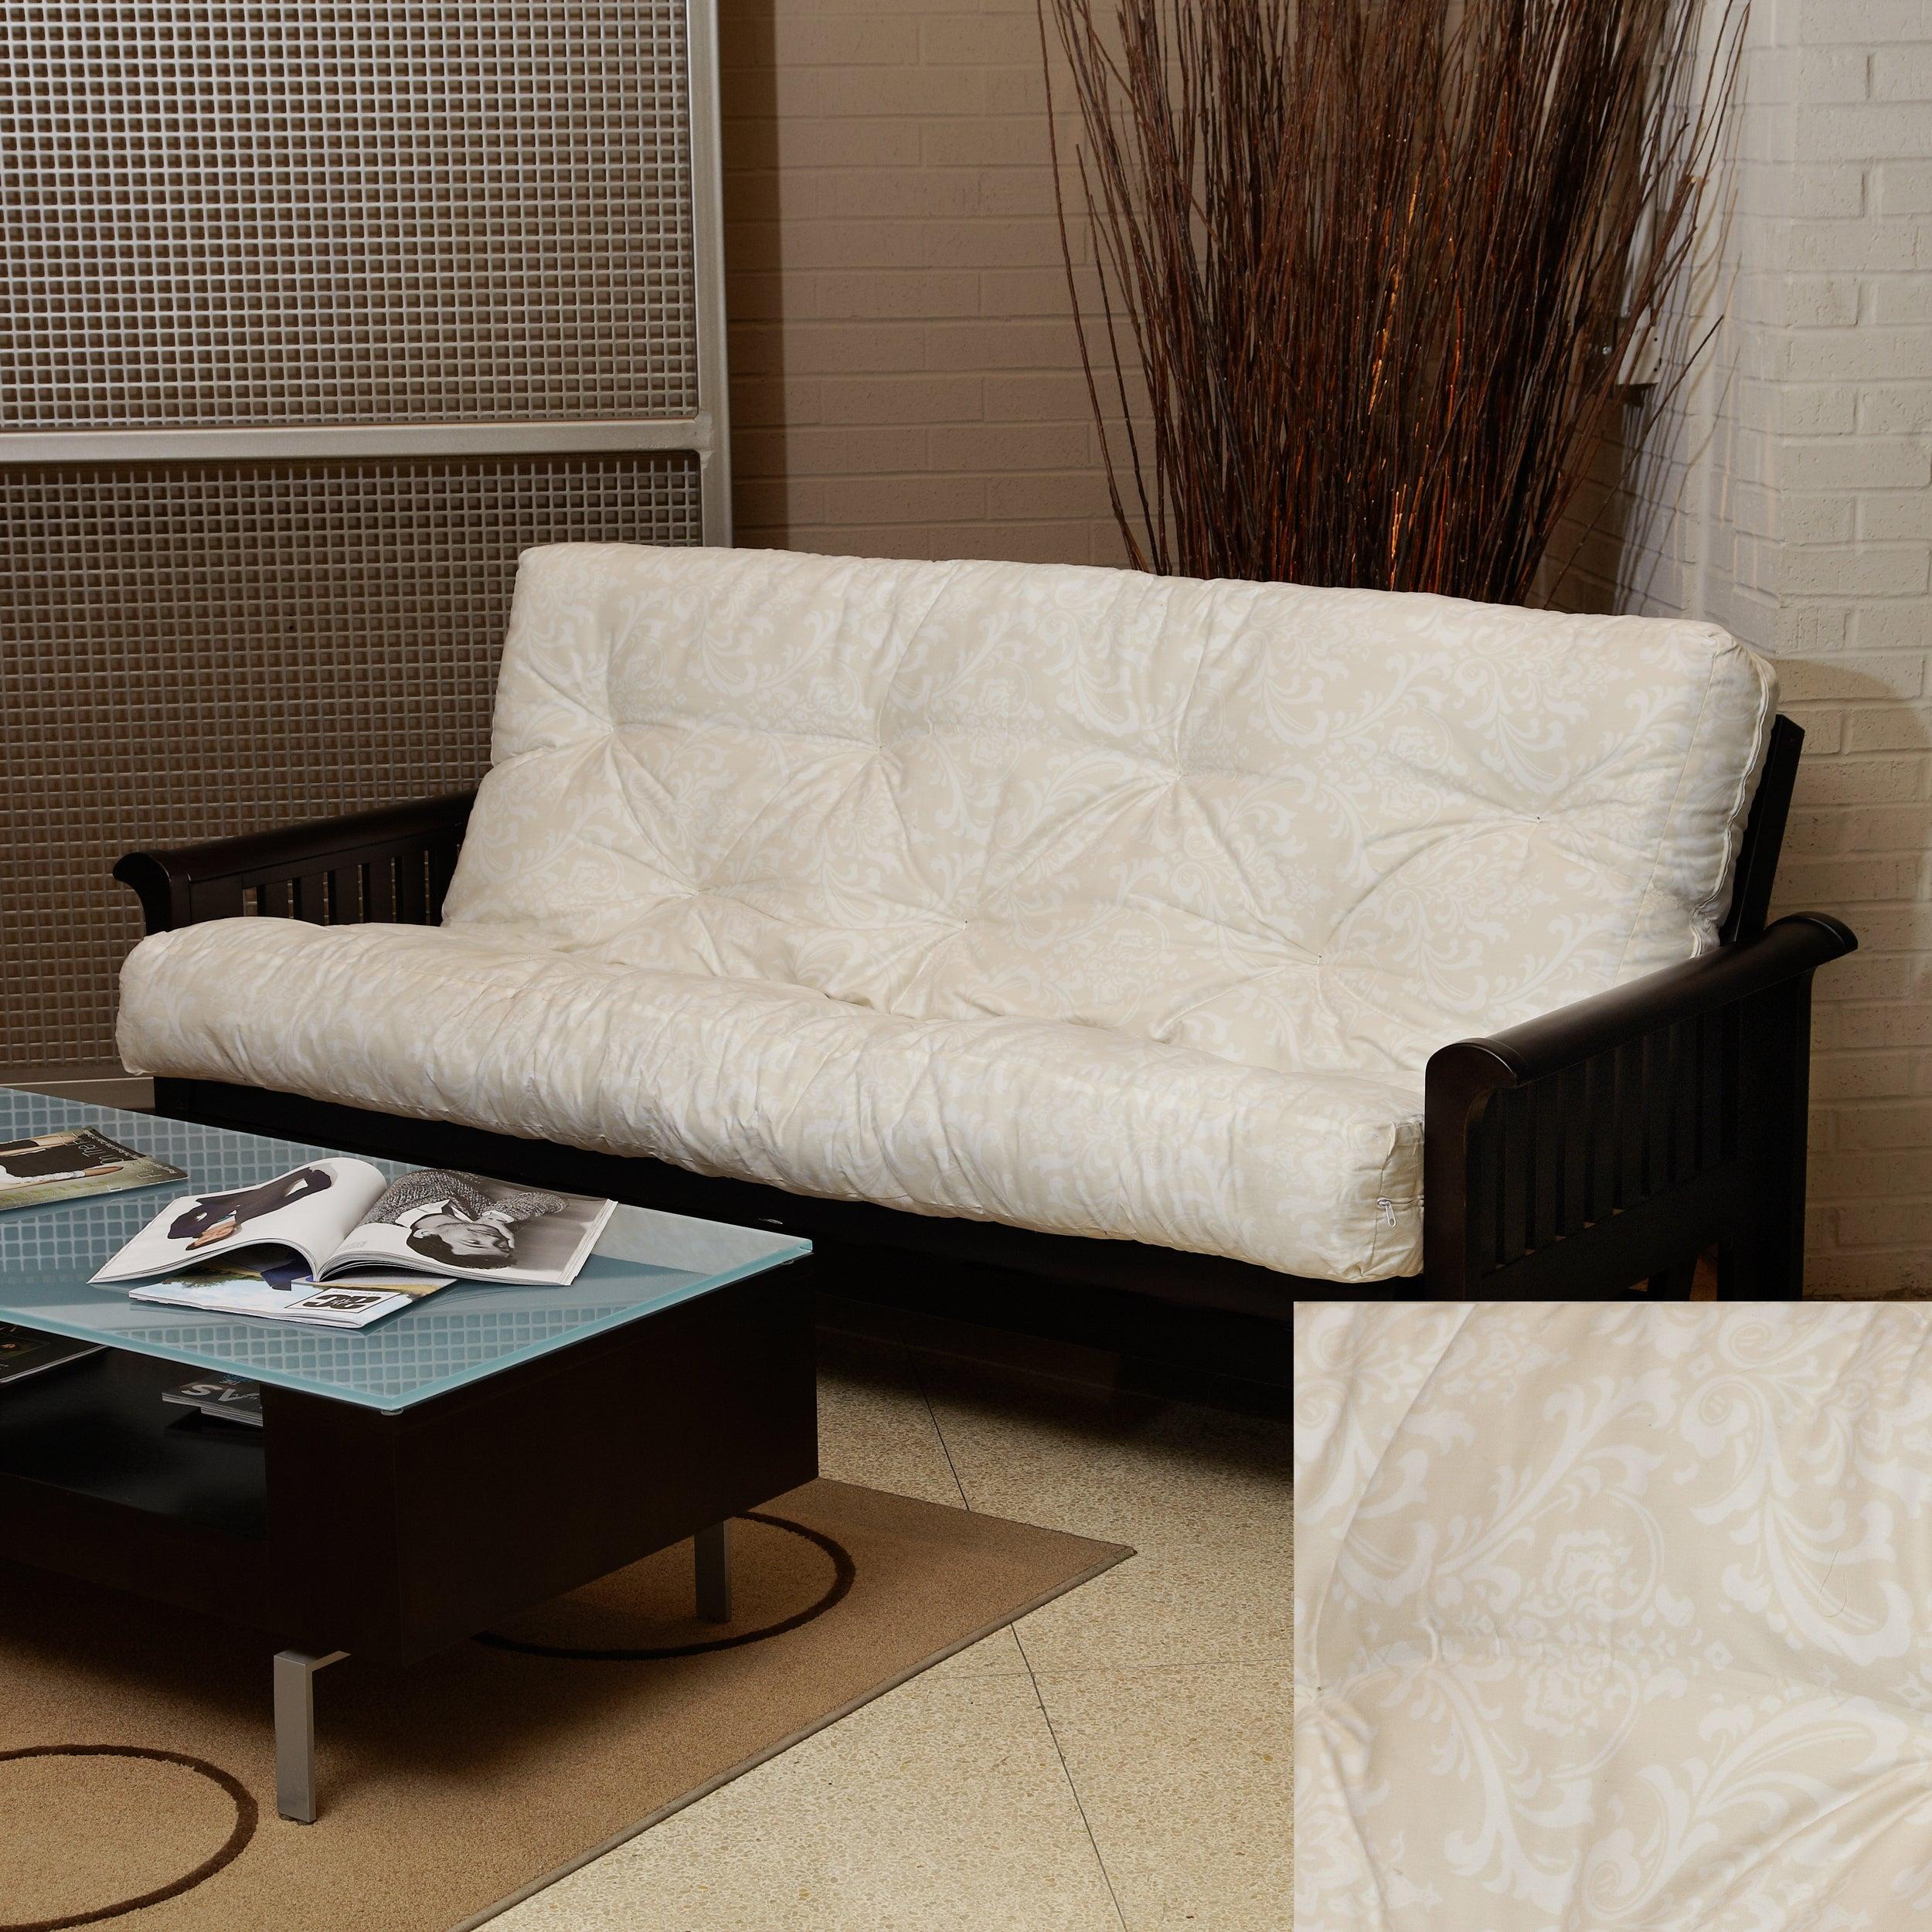 Beige Damask Full-Size 8-inch Futon Mattress